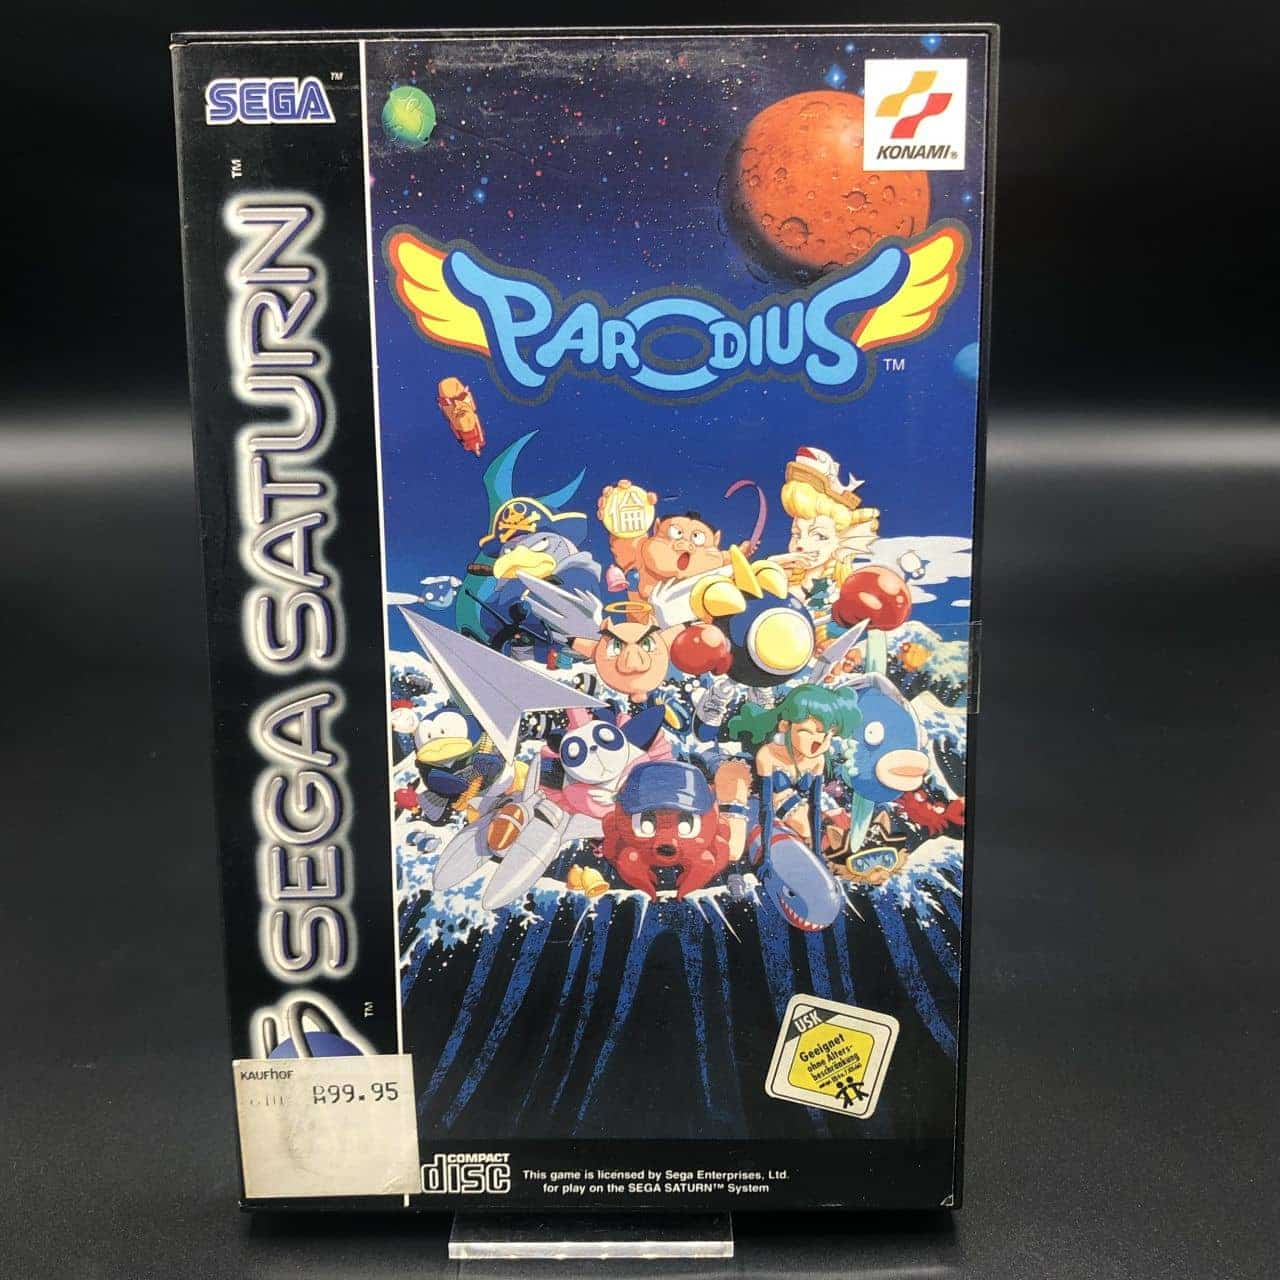 Parodius (Komplett) (Gut) Sega Saturn